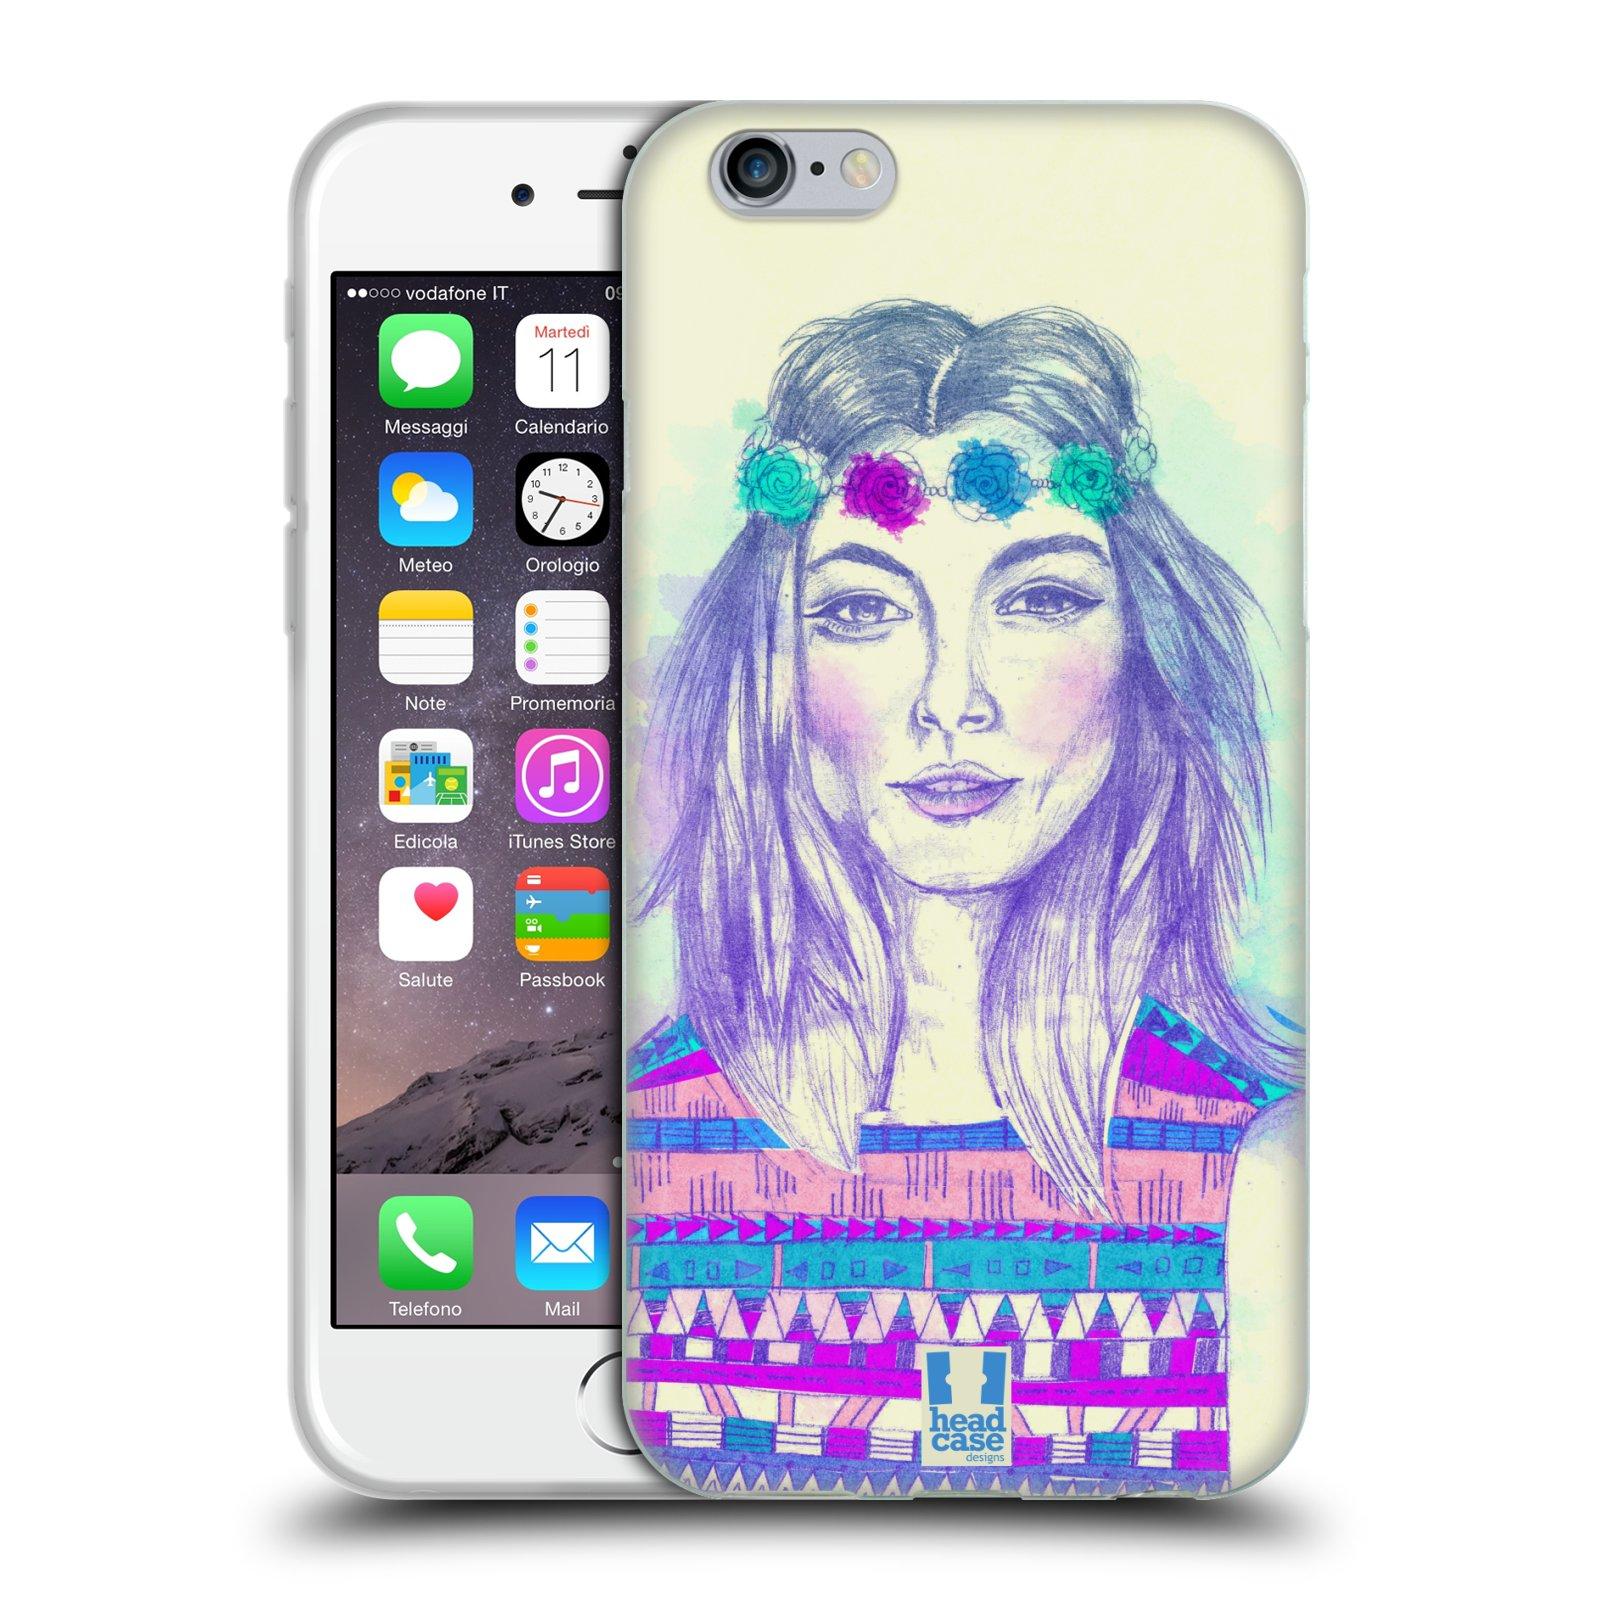 HEAD CASE silikonový obal na mobil Apple Iphone 6/6S vzor Dívka dlouhé květinové vlasy HIPPIE modrá